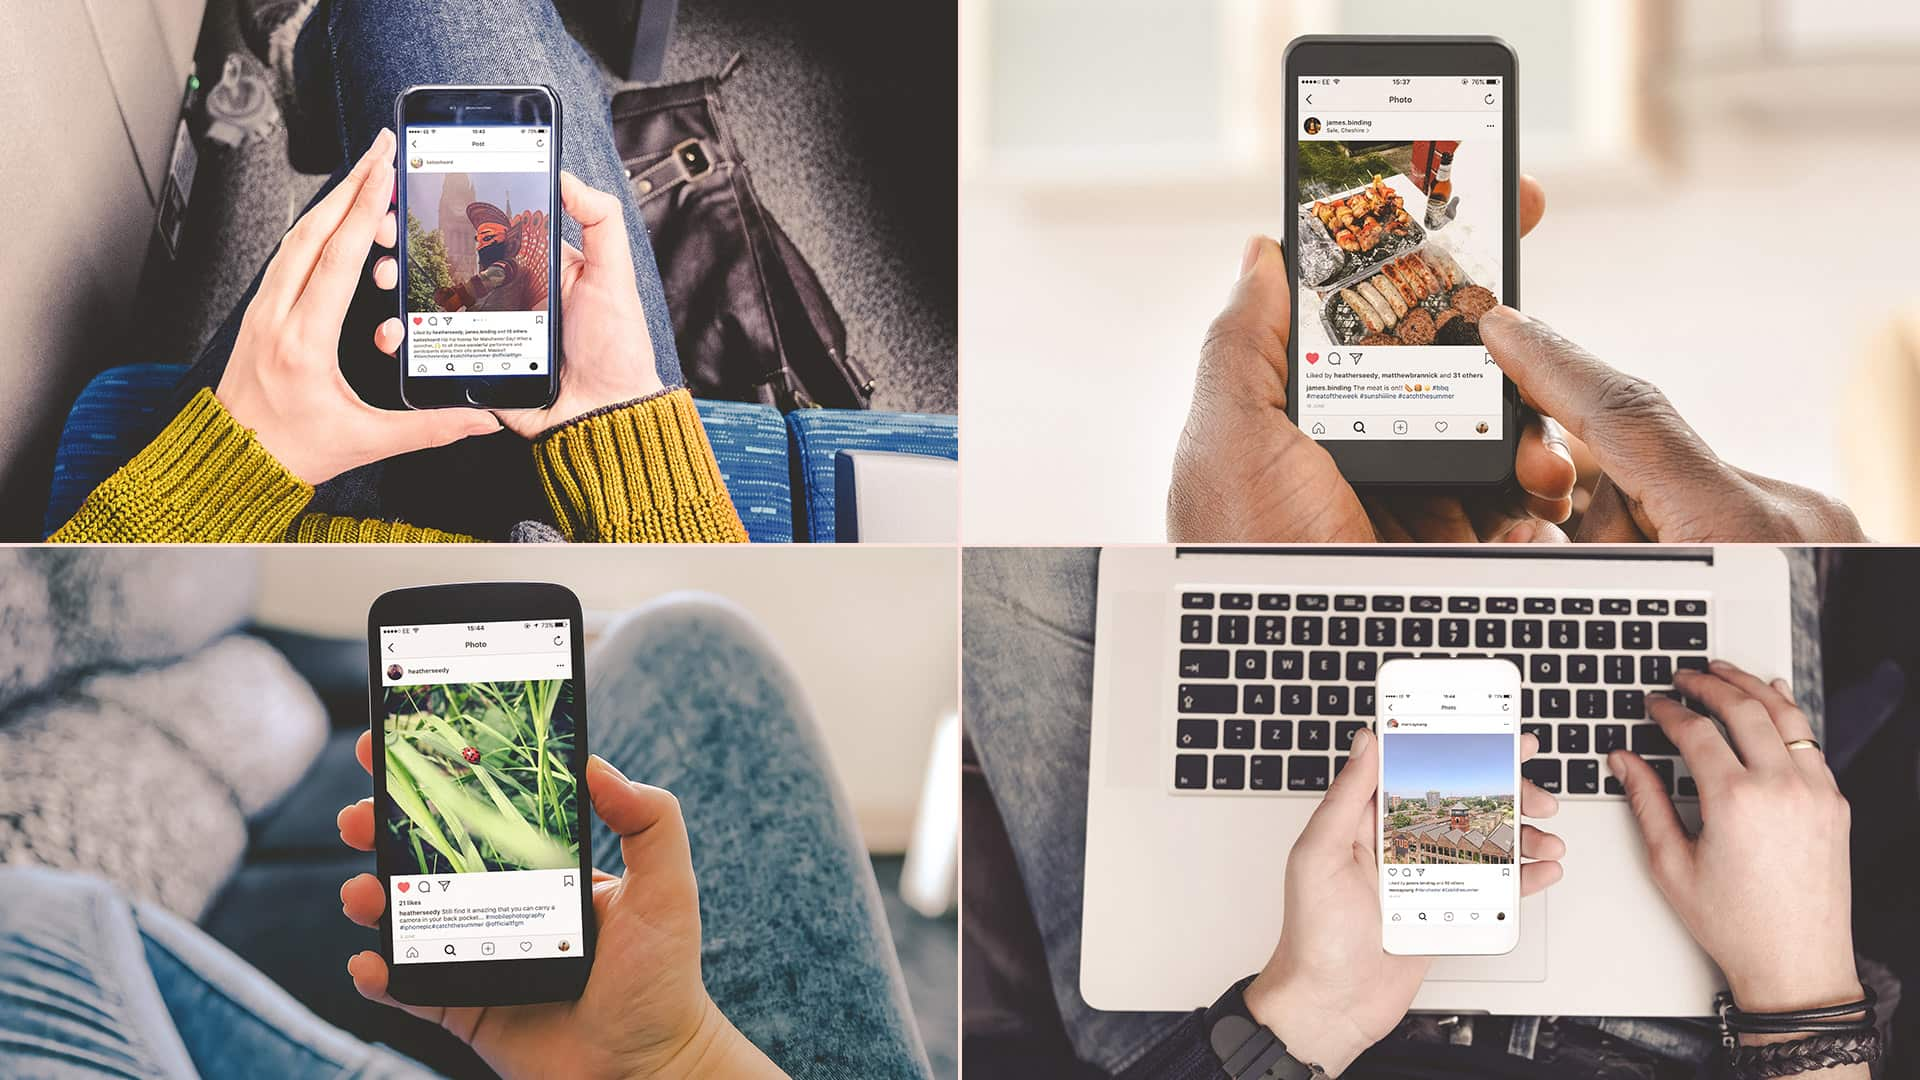 TfGM-social-media-marketing-agency-ugc-influencer-marketing-campaign